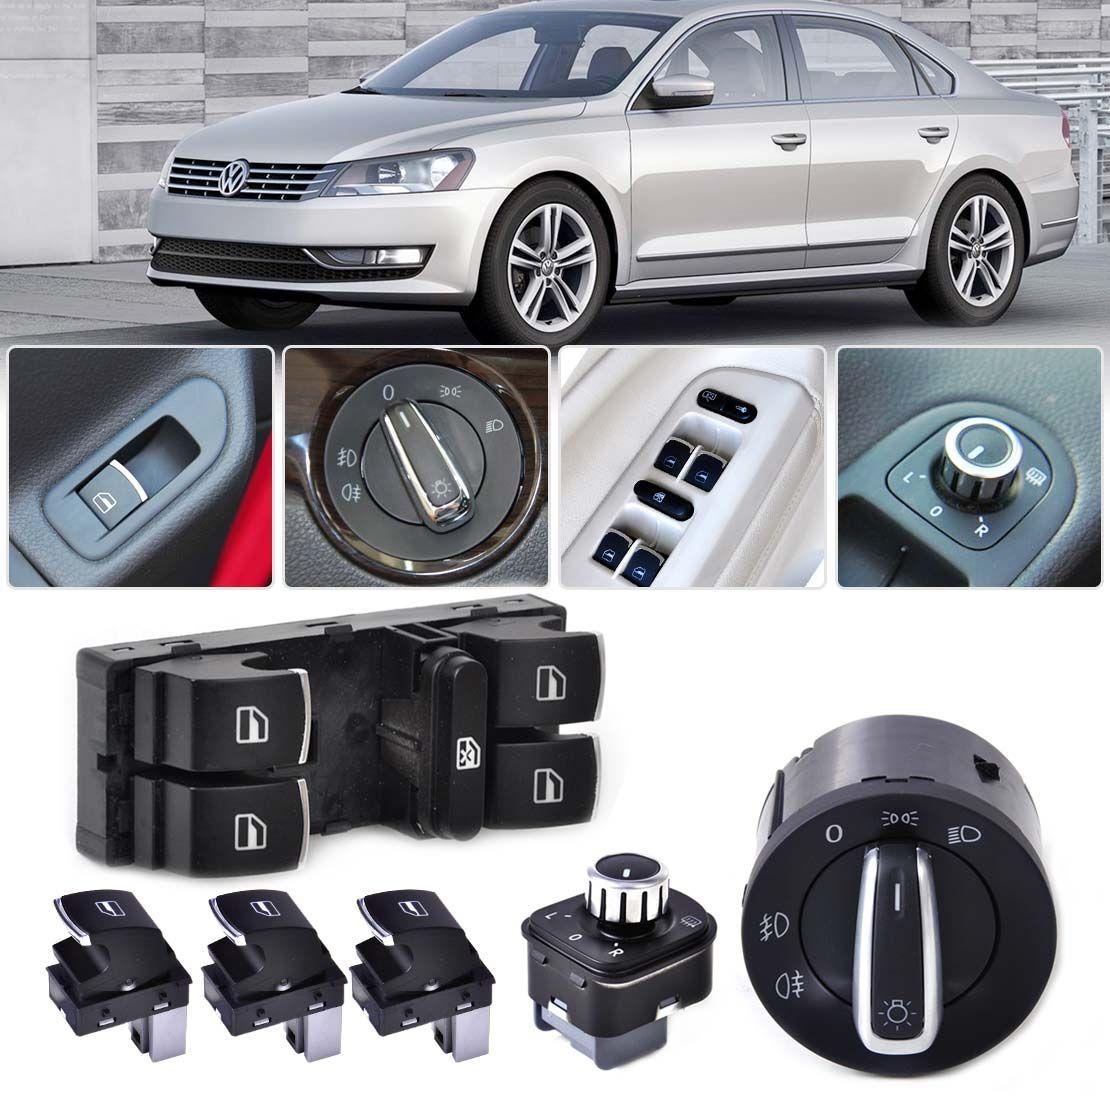 Headlight Mirror Window Switch Control Set Fit For Vw Golf Jetta Gti Volkswagen Wiring Harness Mk5 Mk6 Passat B6